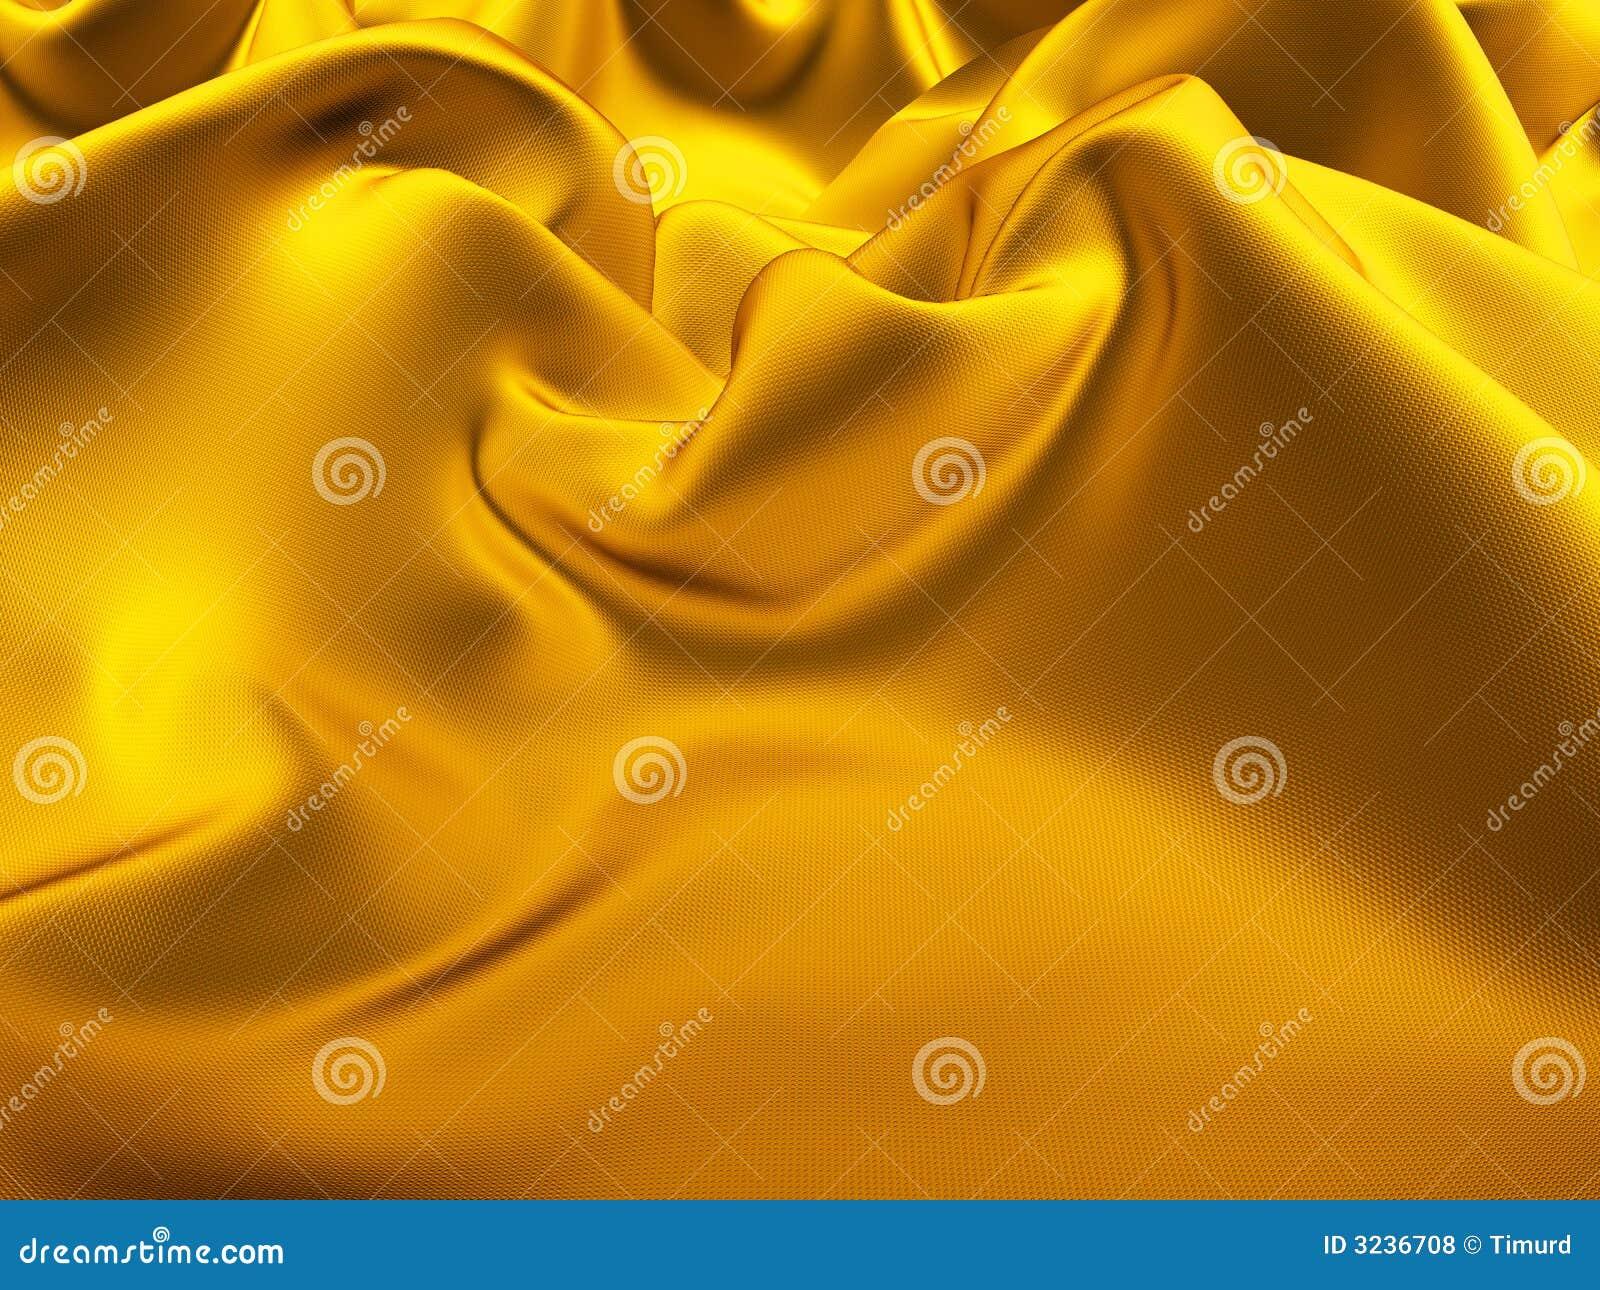 Gold silk